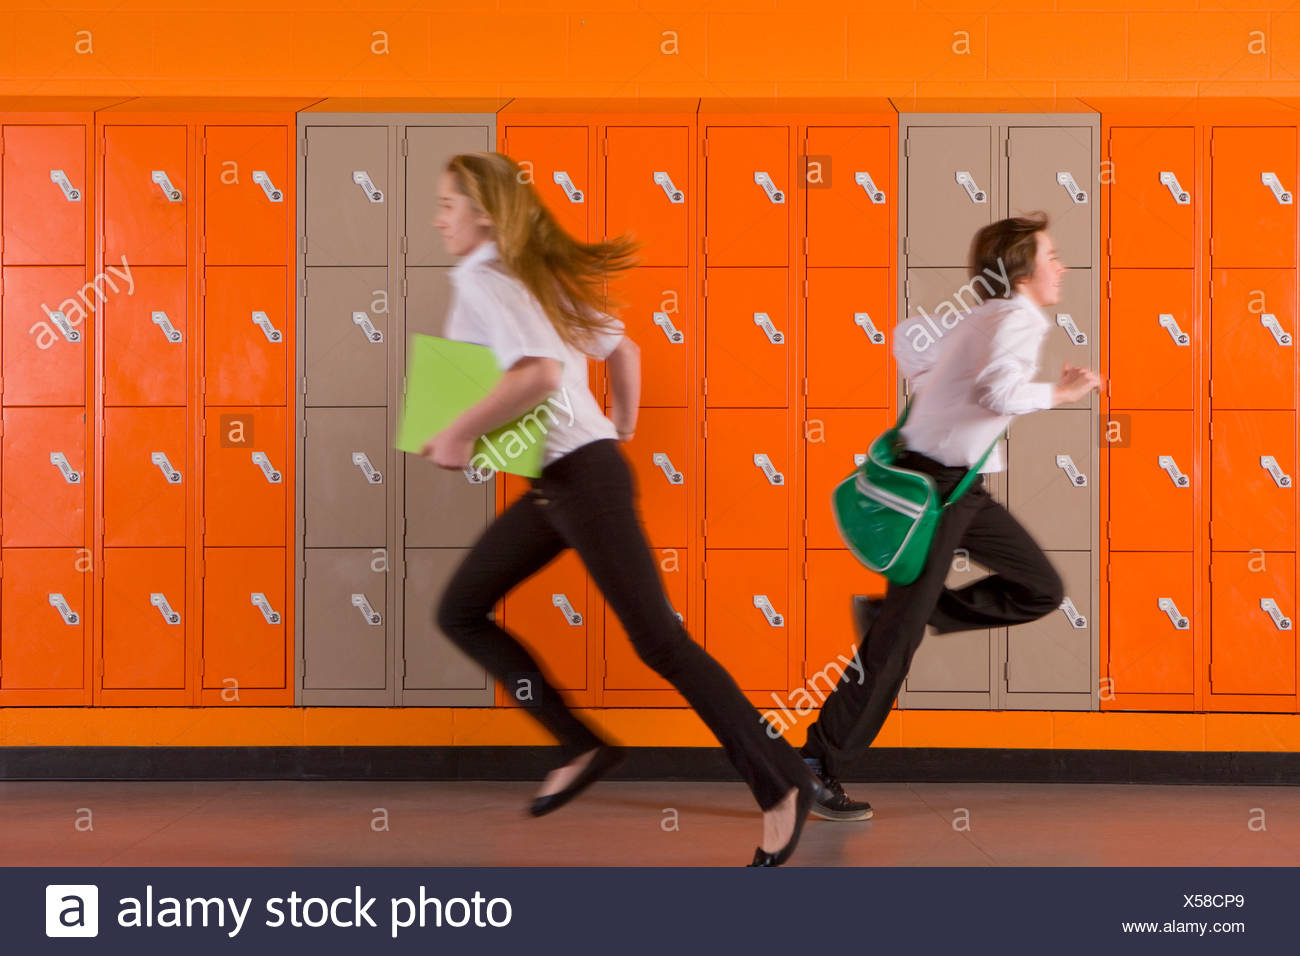 Students rushing past school lockers - Stock Image